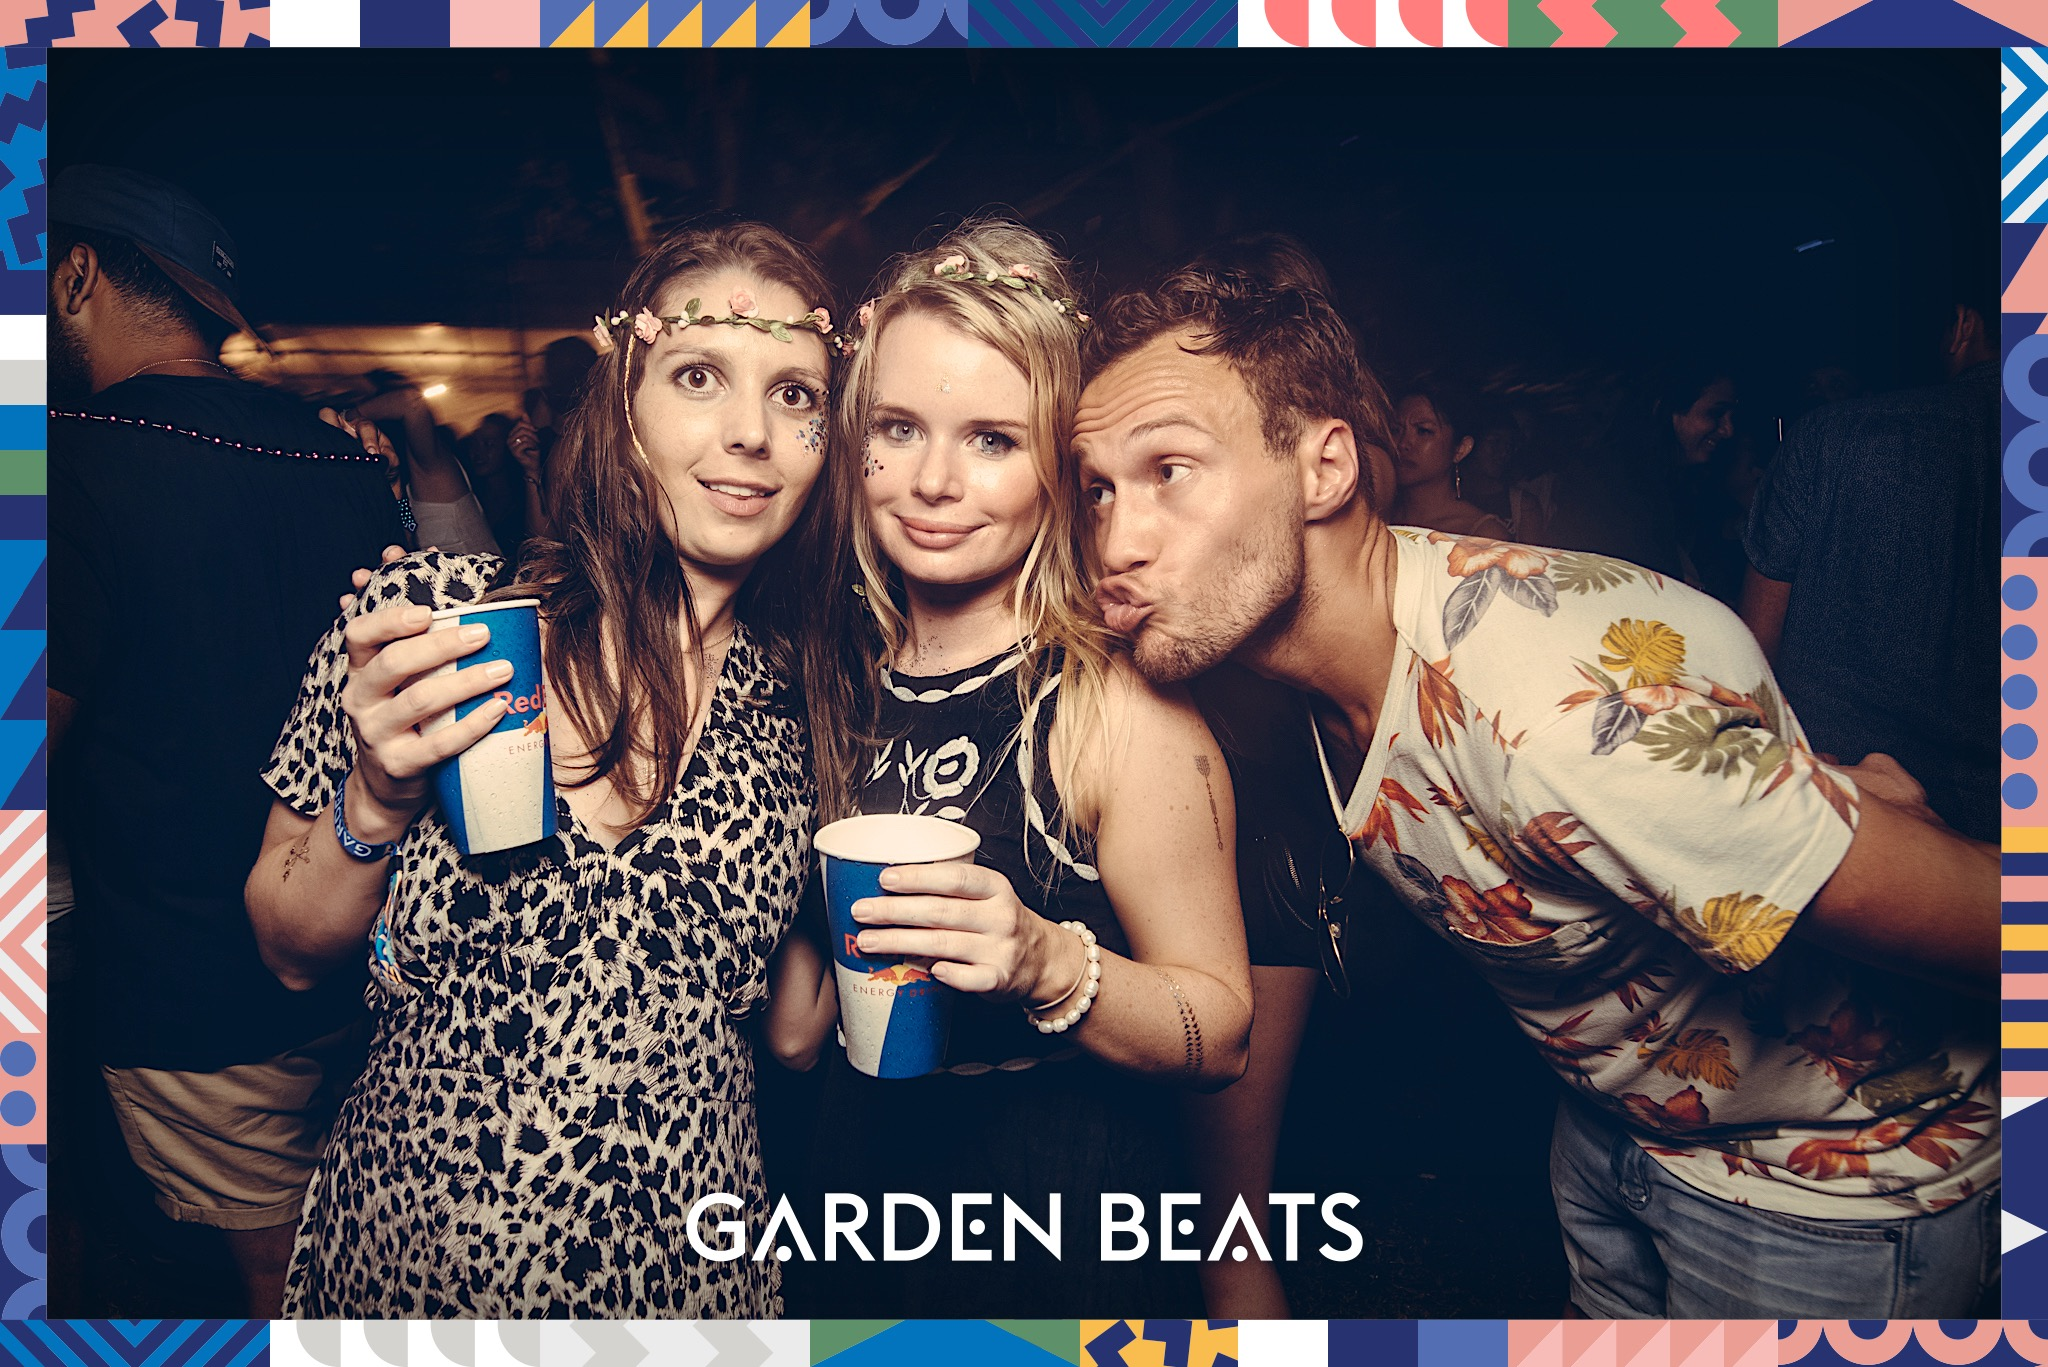 18032017_GardenBeats_Colossal744_WatermarkedGB.jpg